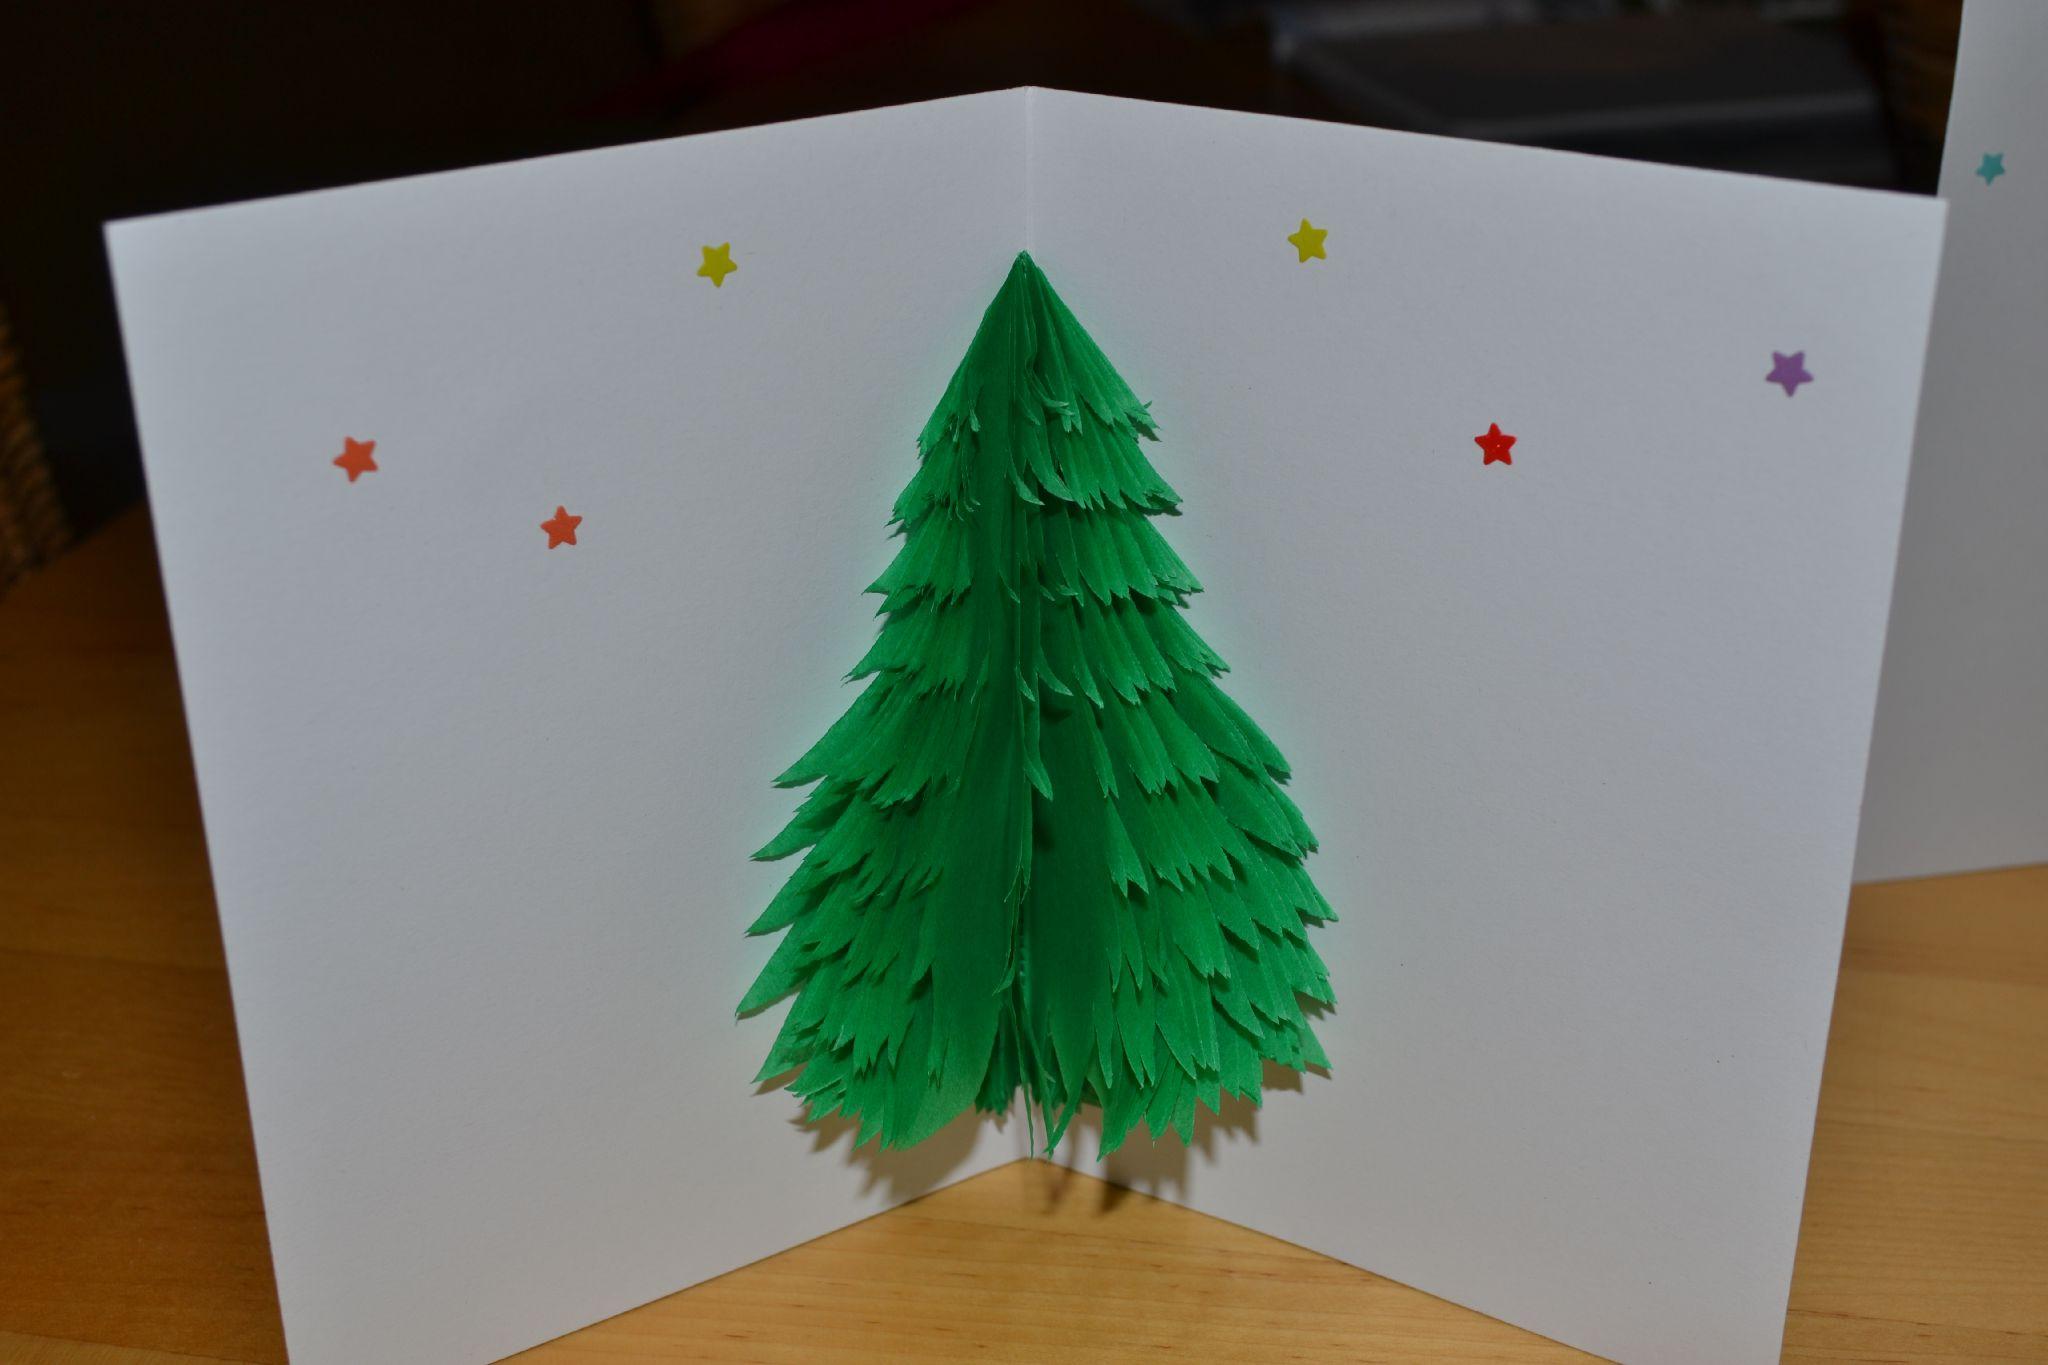 Fabriquer des cartes de noel en relief